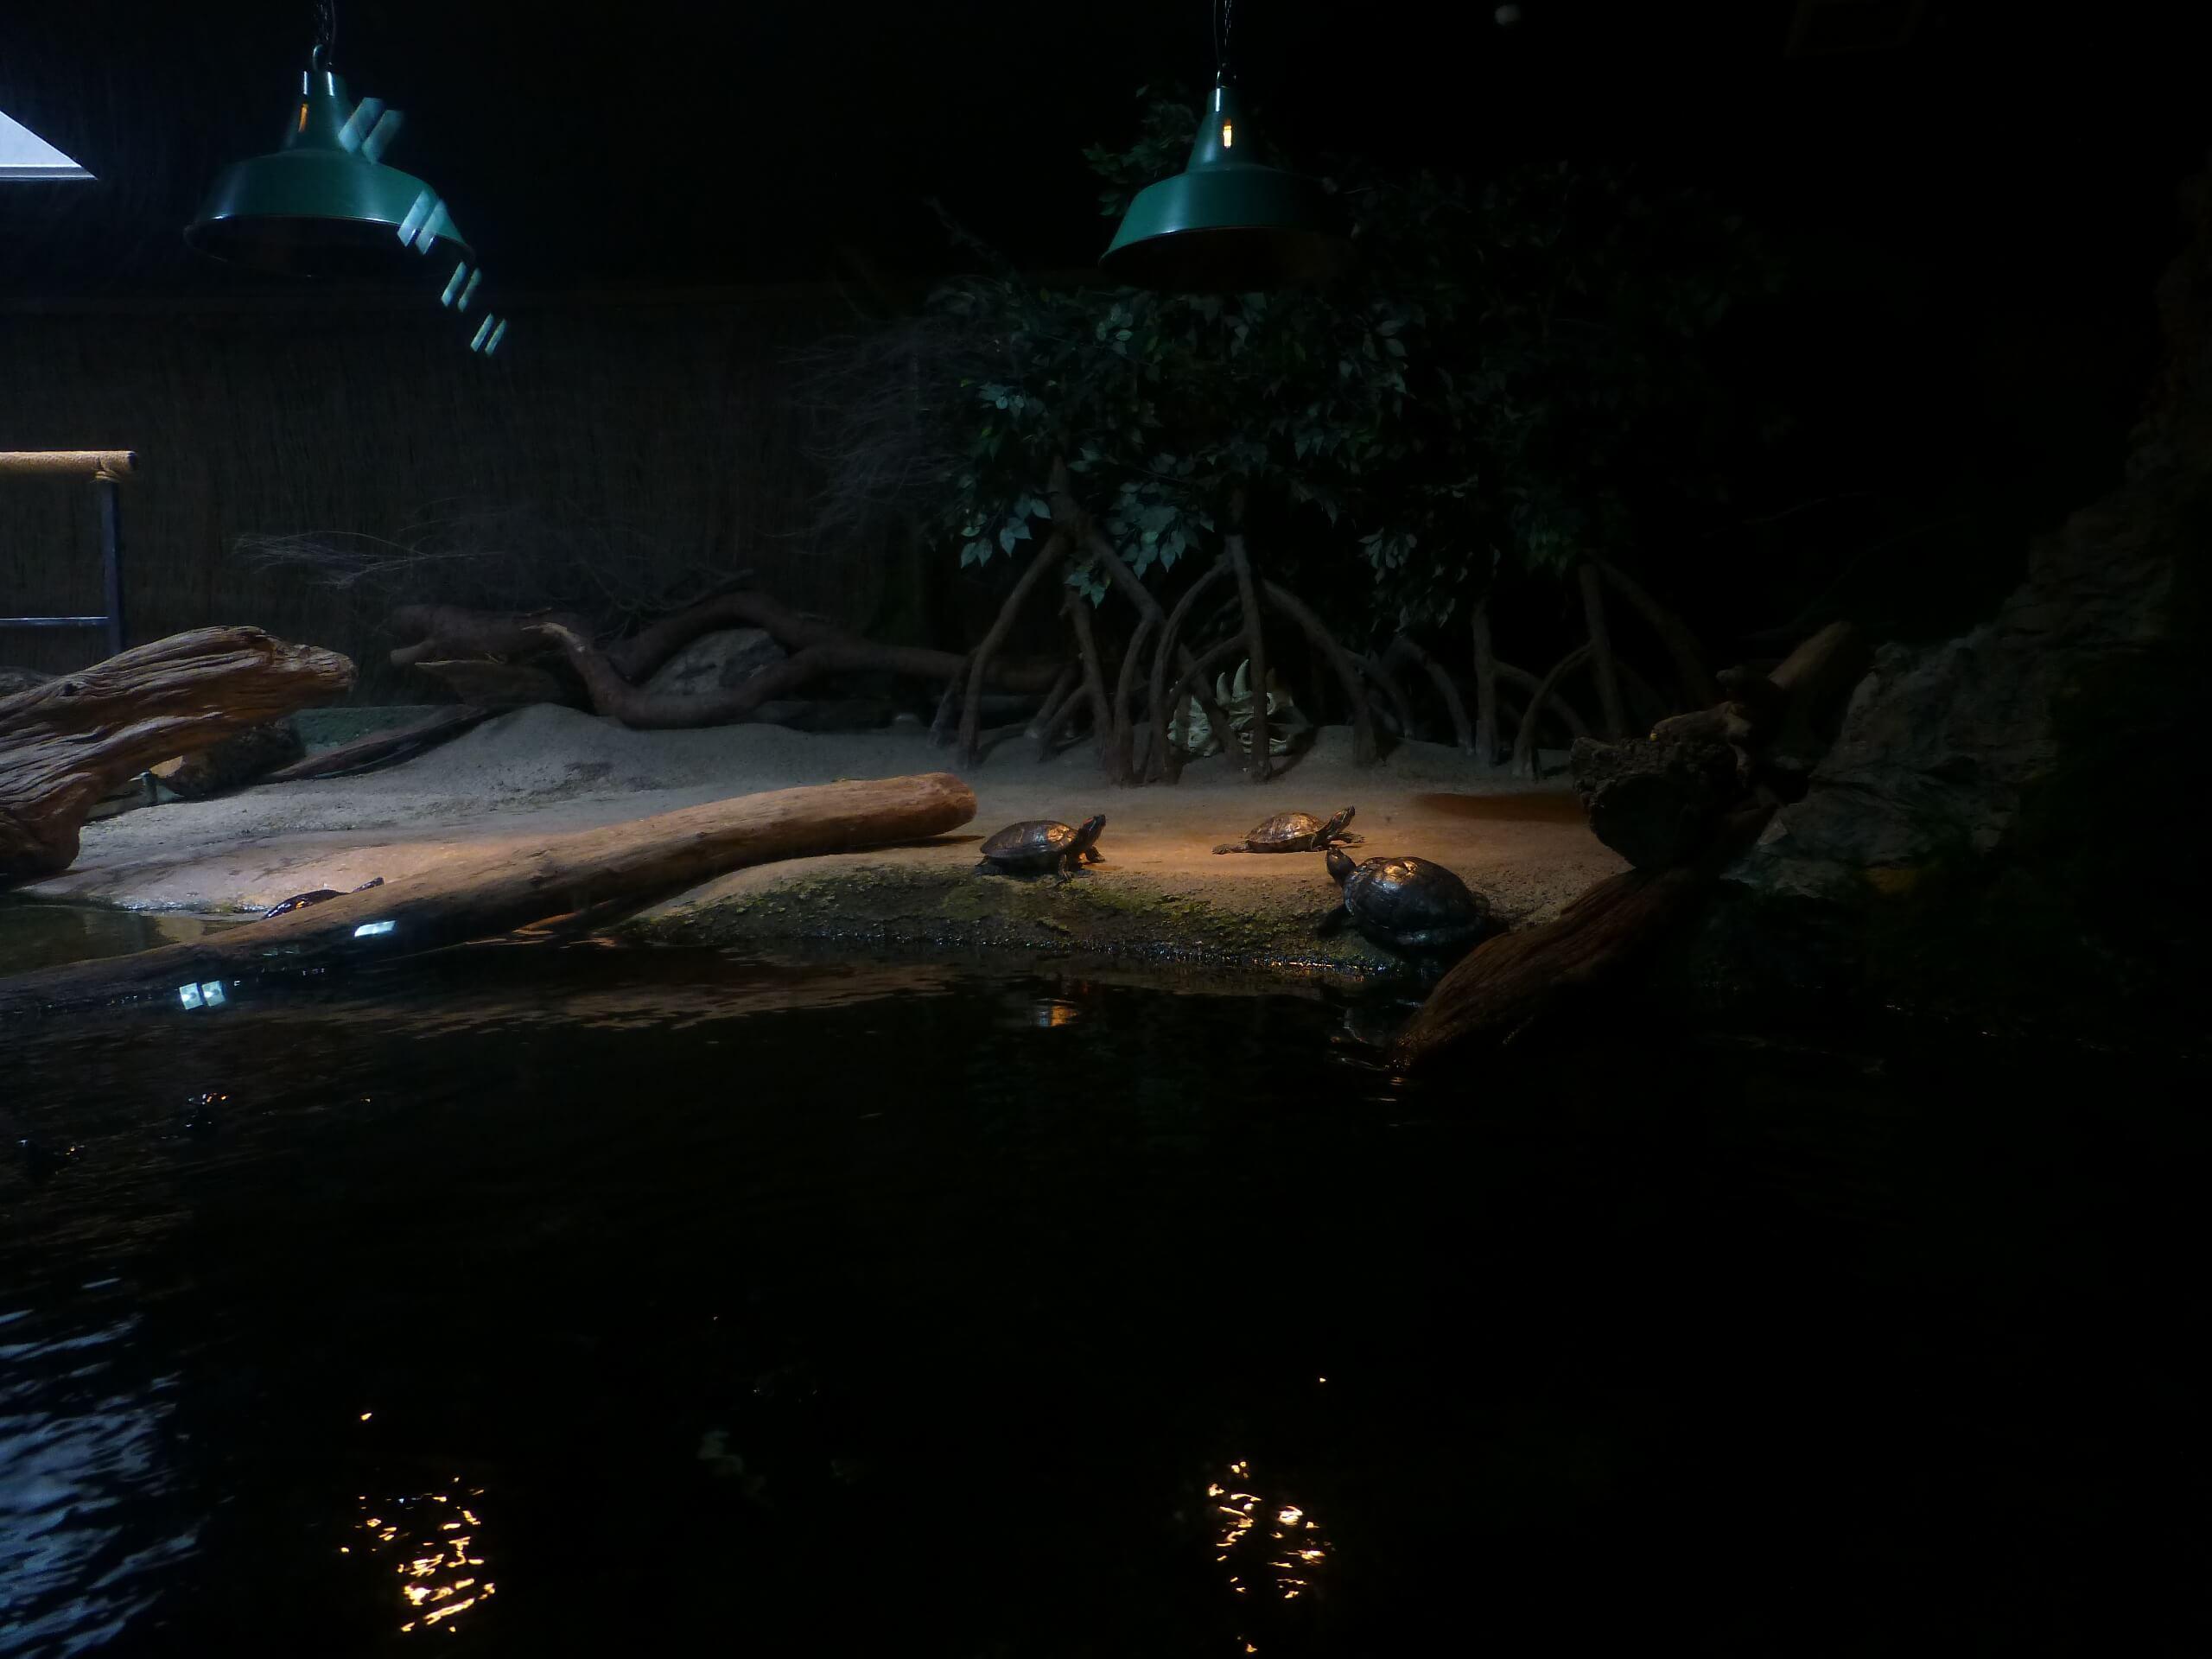 Weit weg Reisen, National Aquarium, Napier 8